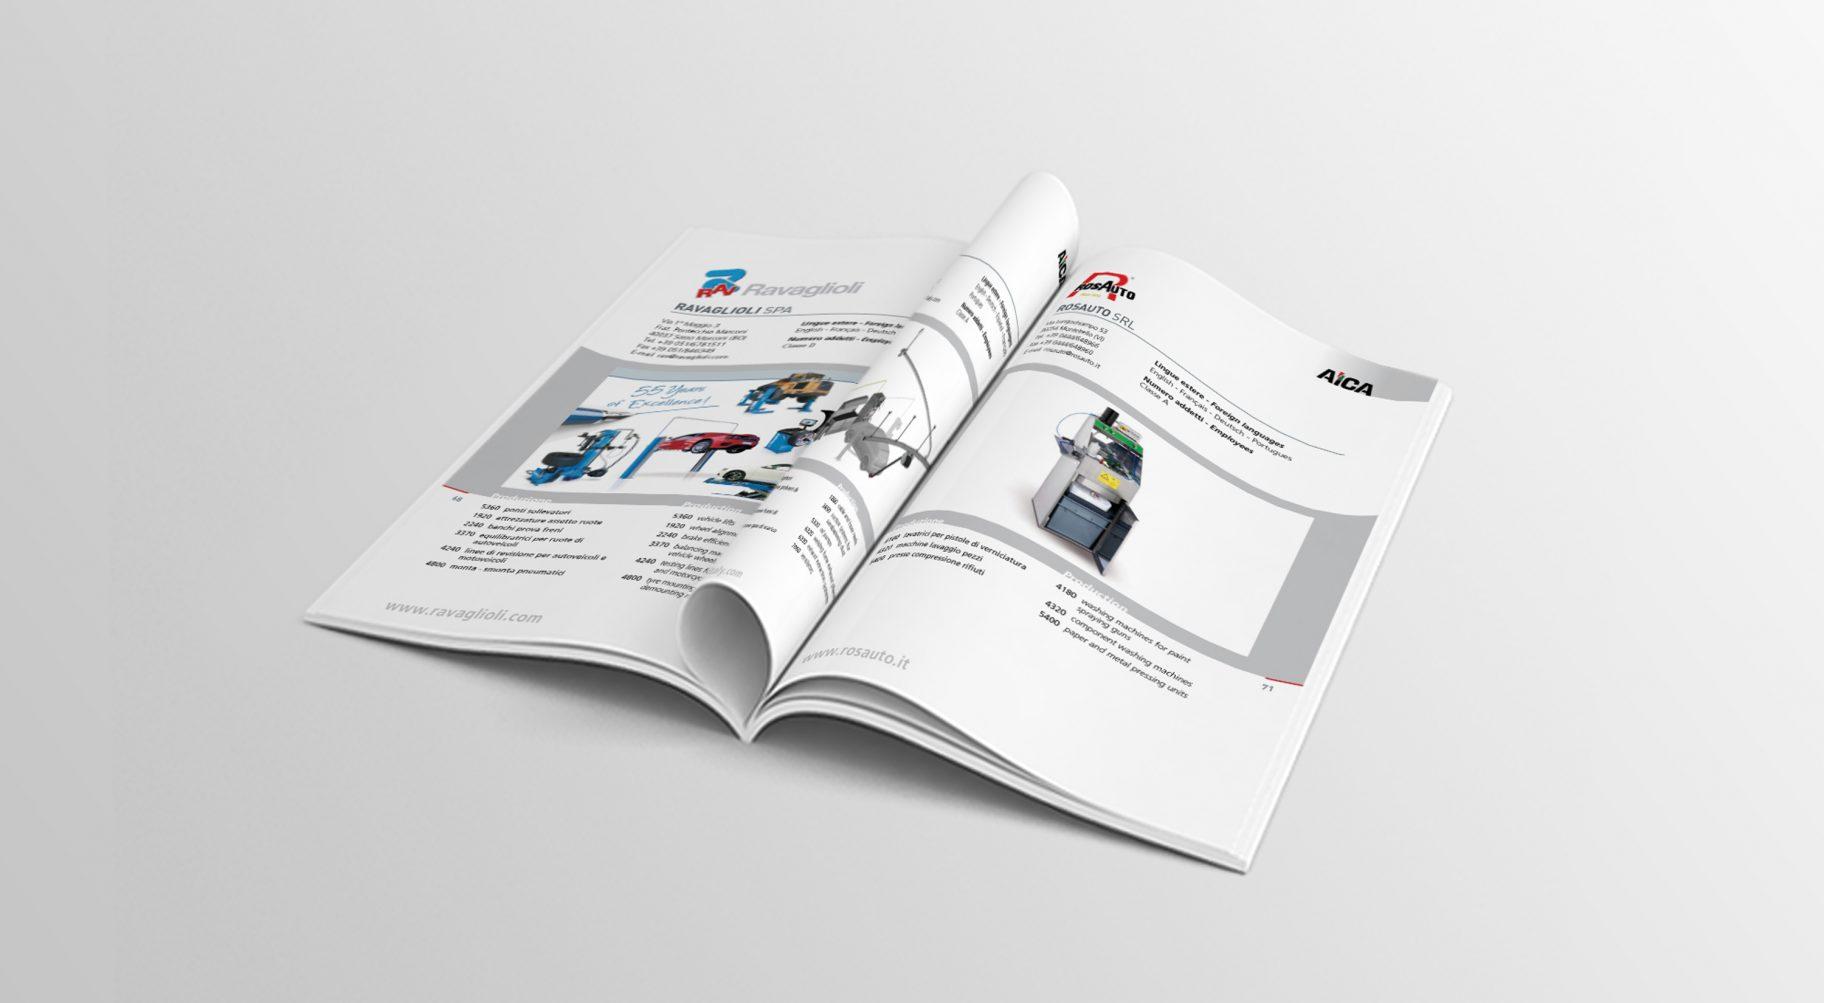 AICA 2013_Brochure-catalogo-interno 02